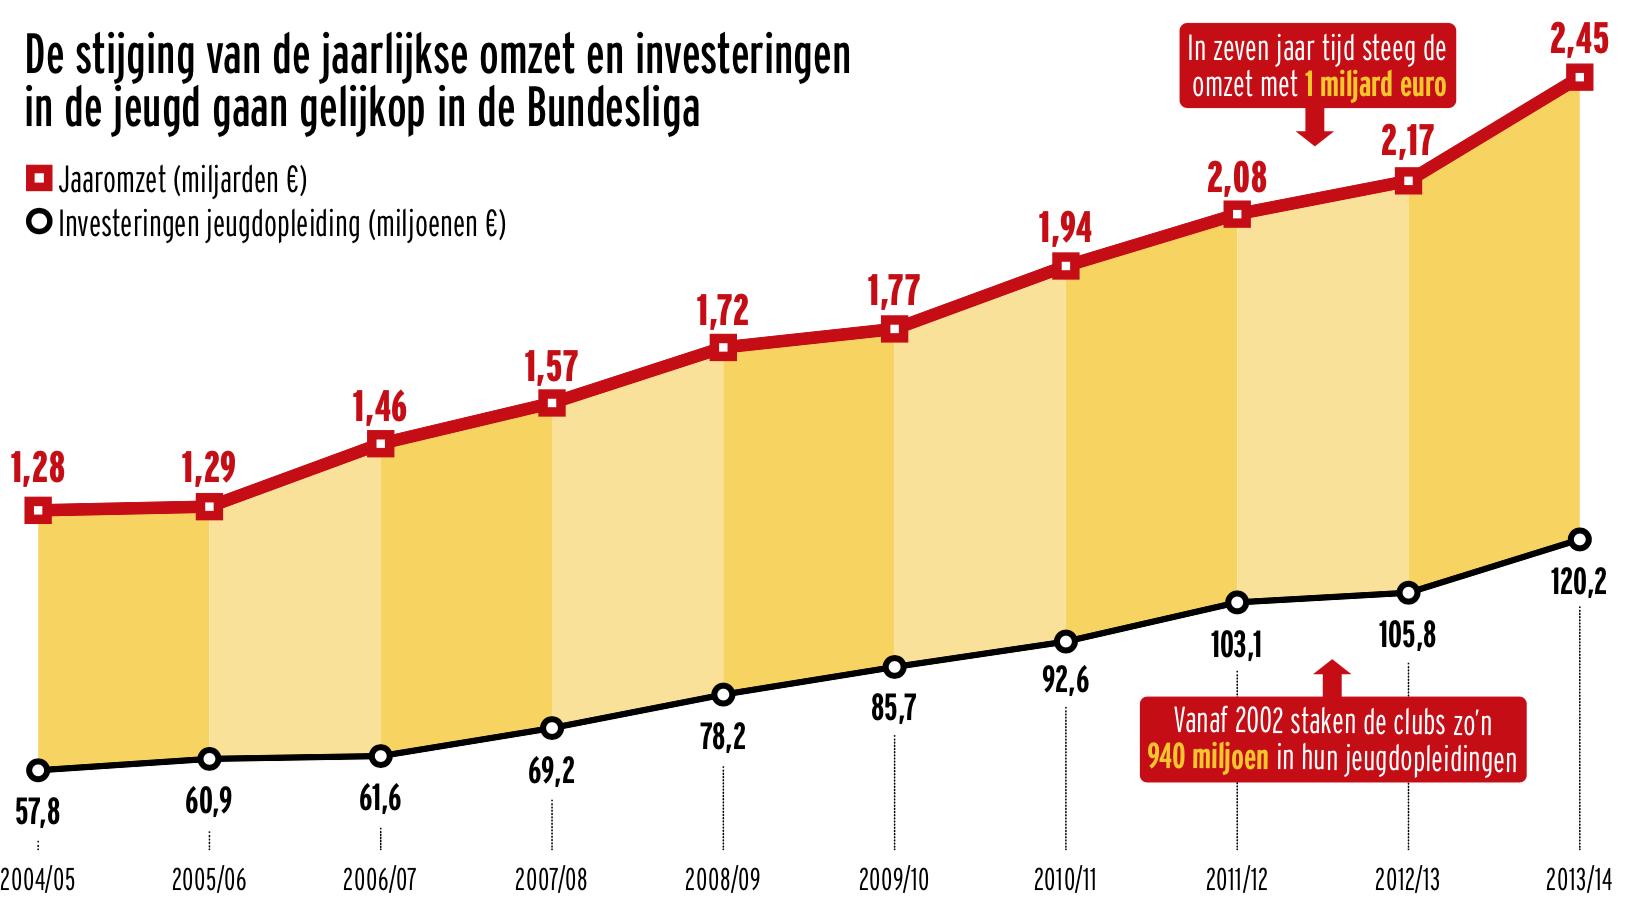 Graphic omzet vs investing in toekomst